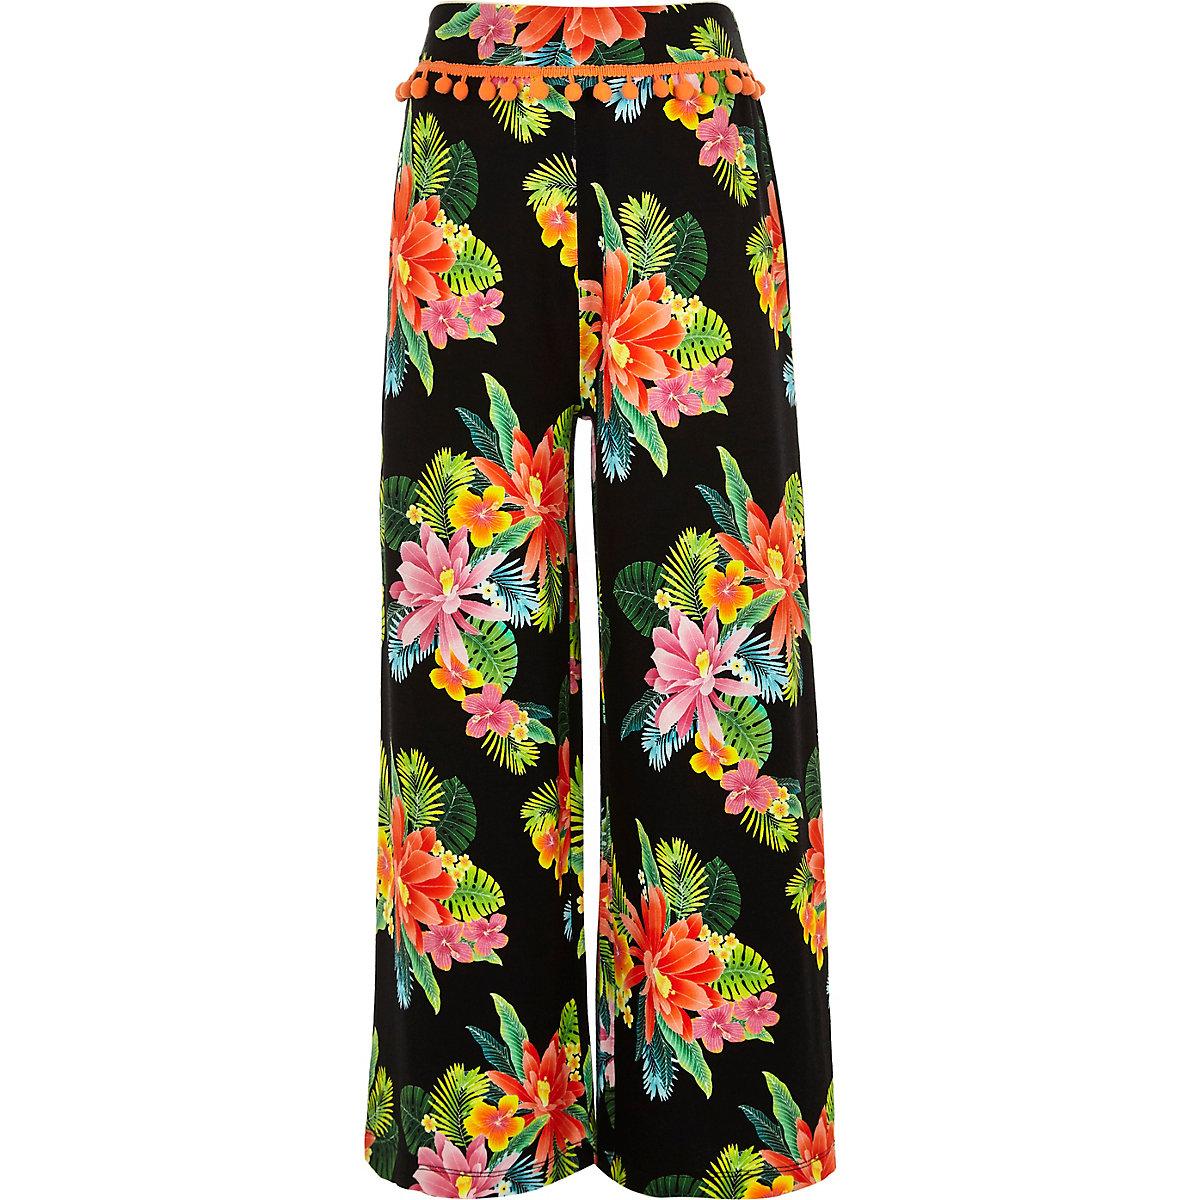 Girls black wide leg floral print pants